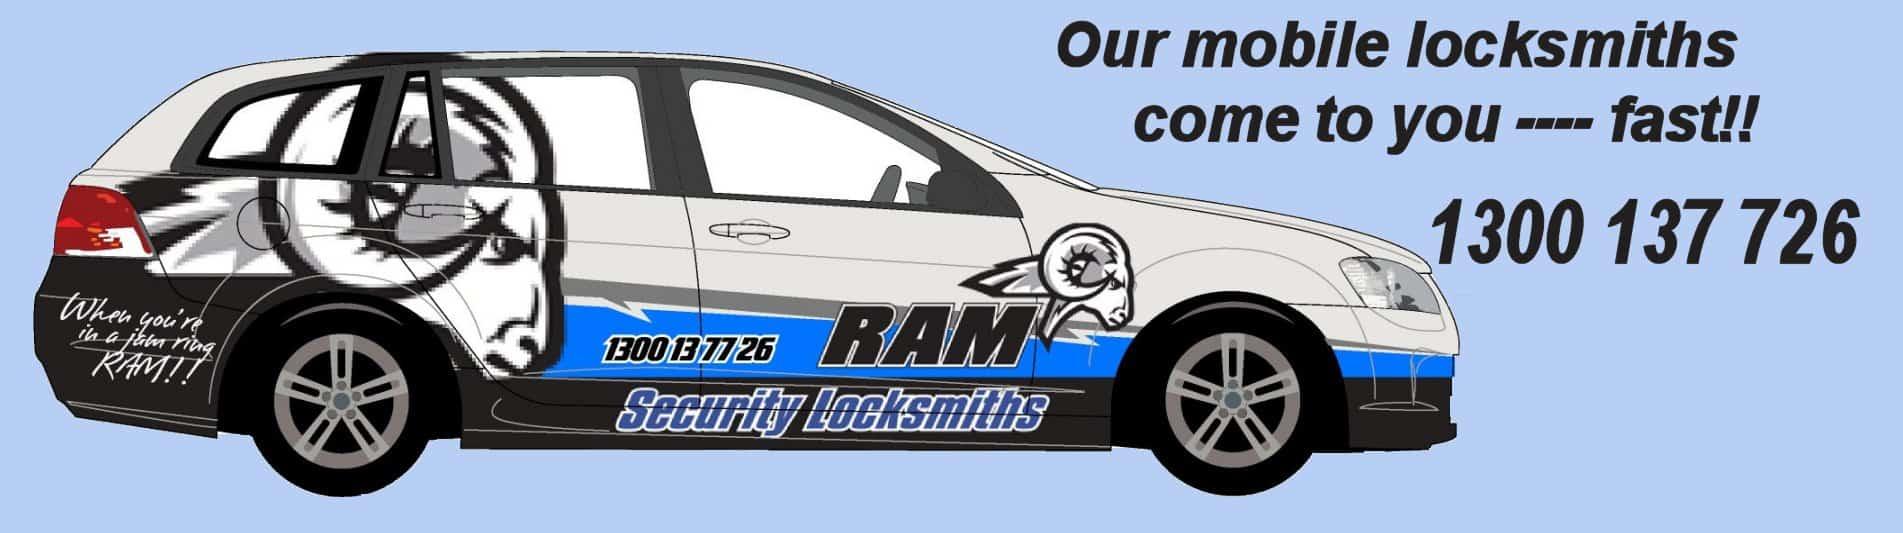 RAM-LS-Banner-Mobile-2-1903x533